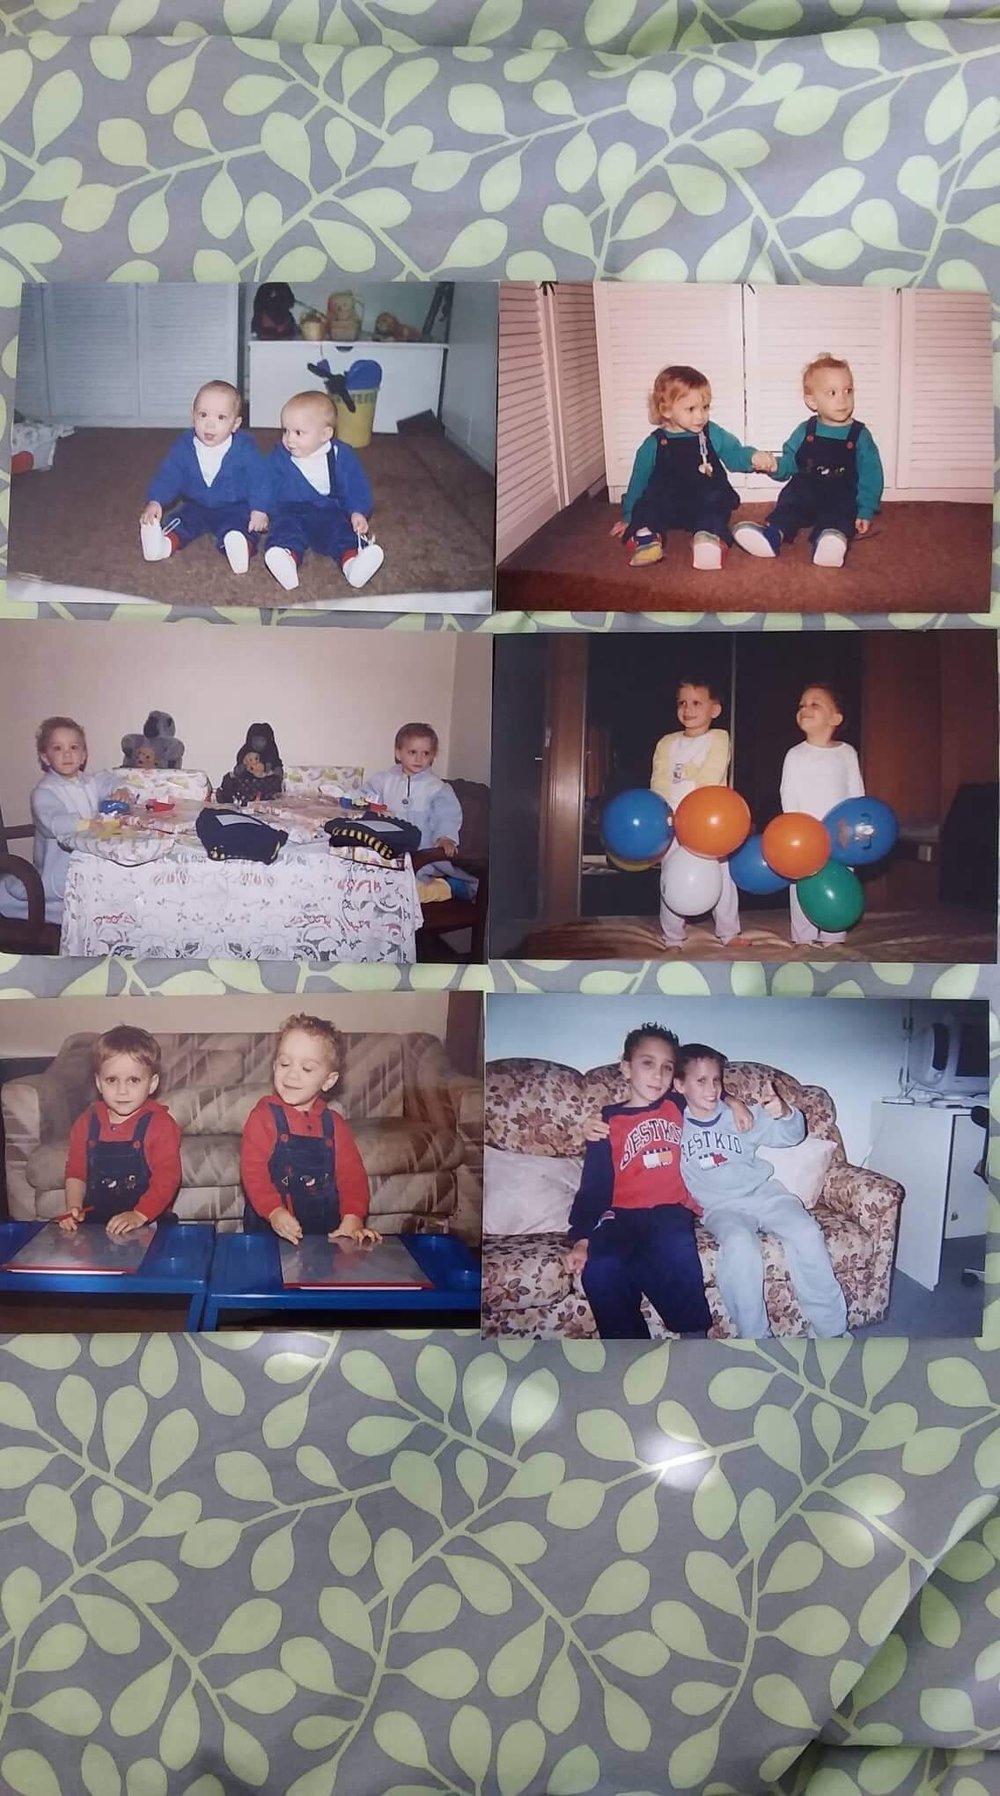 Paulo & I as kids… yeah we were cool as f*ck!